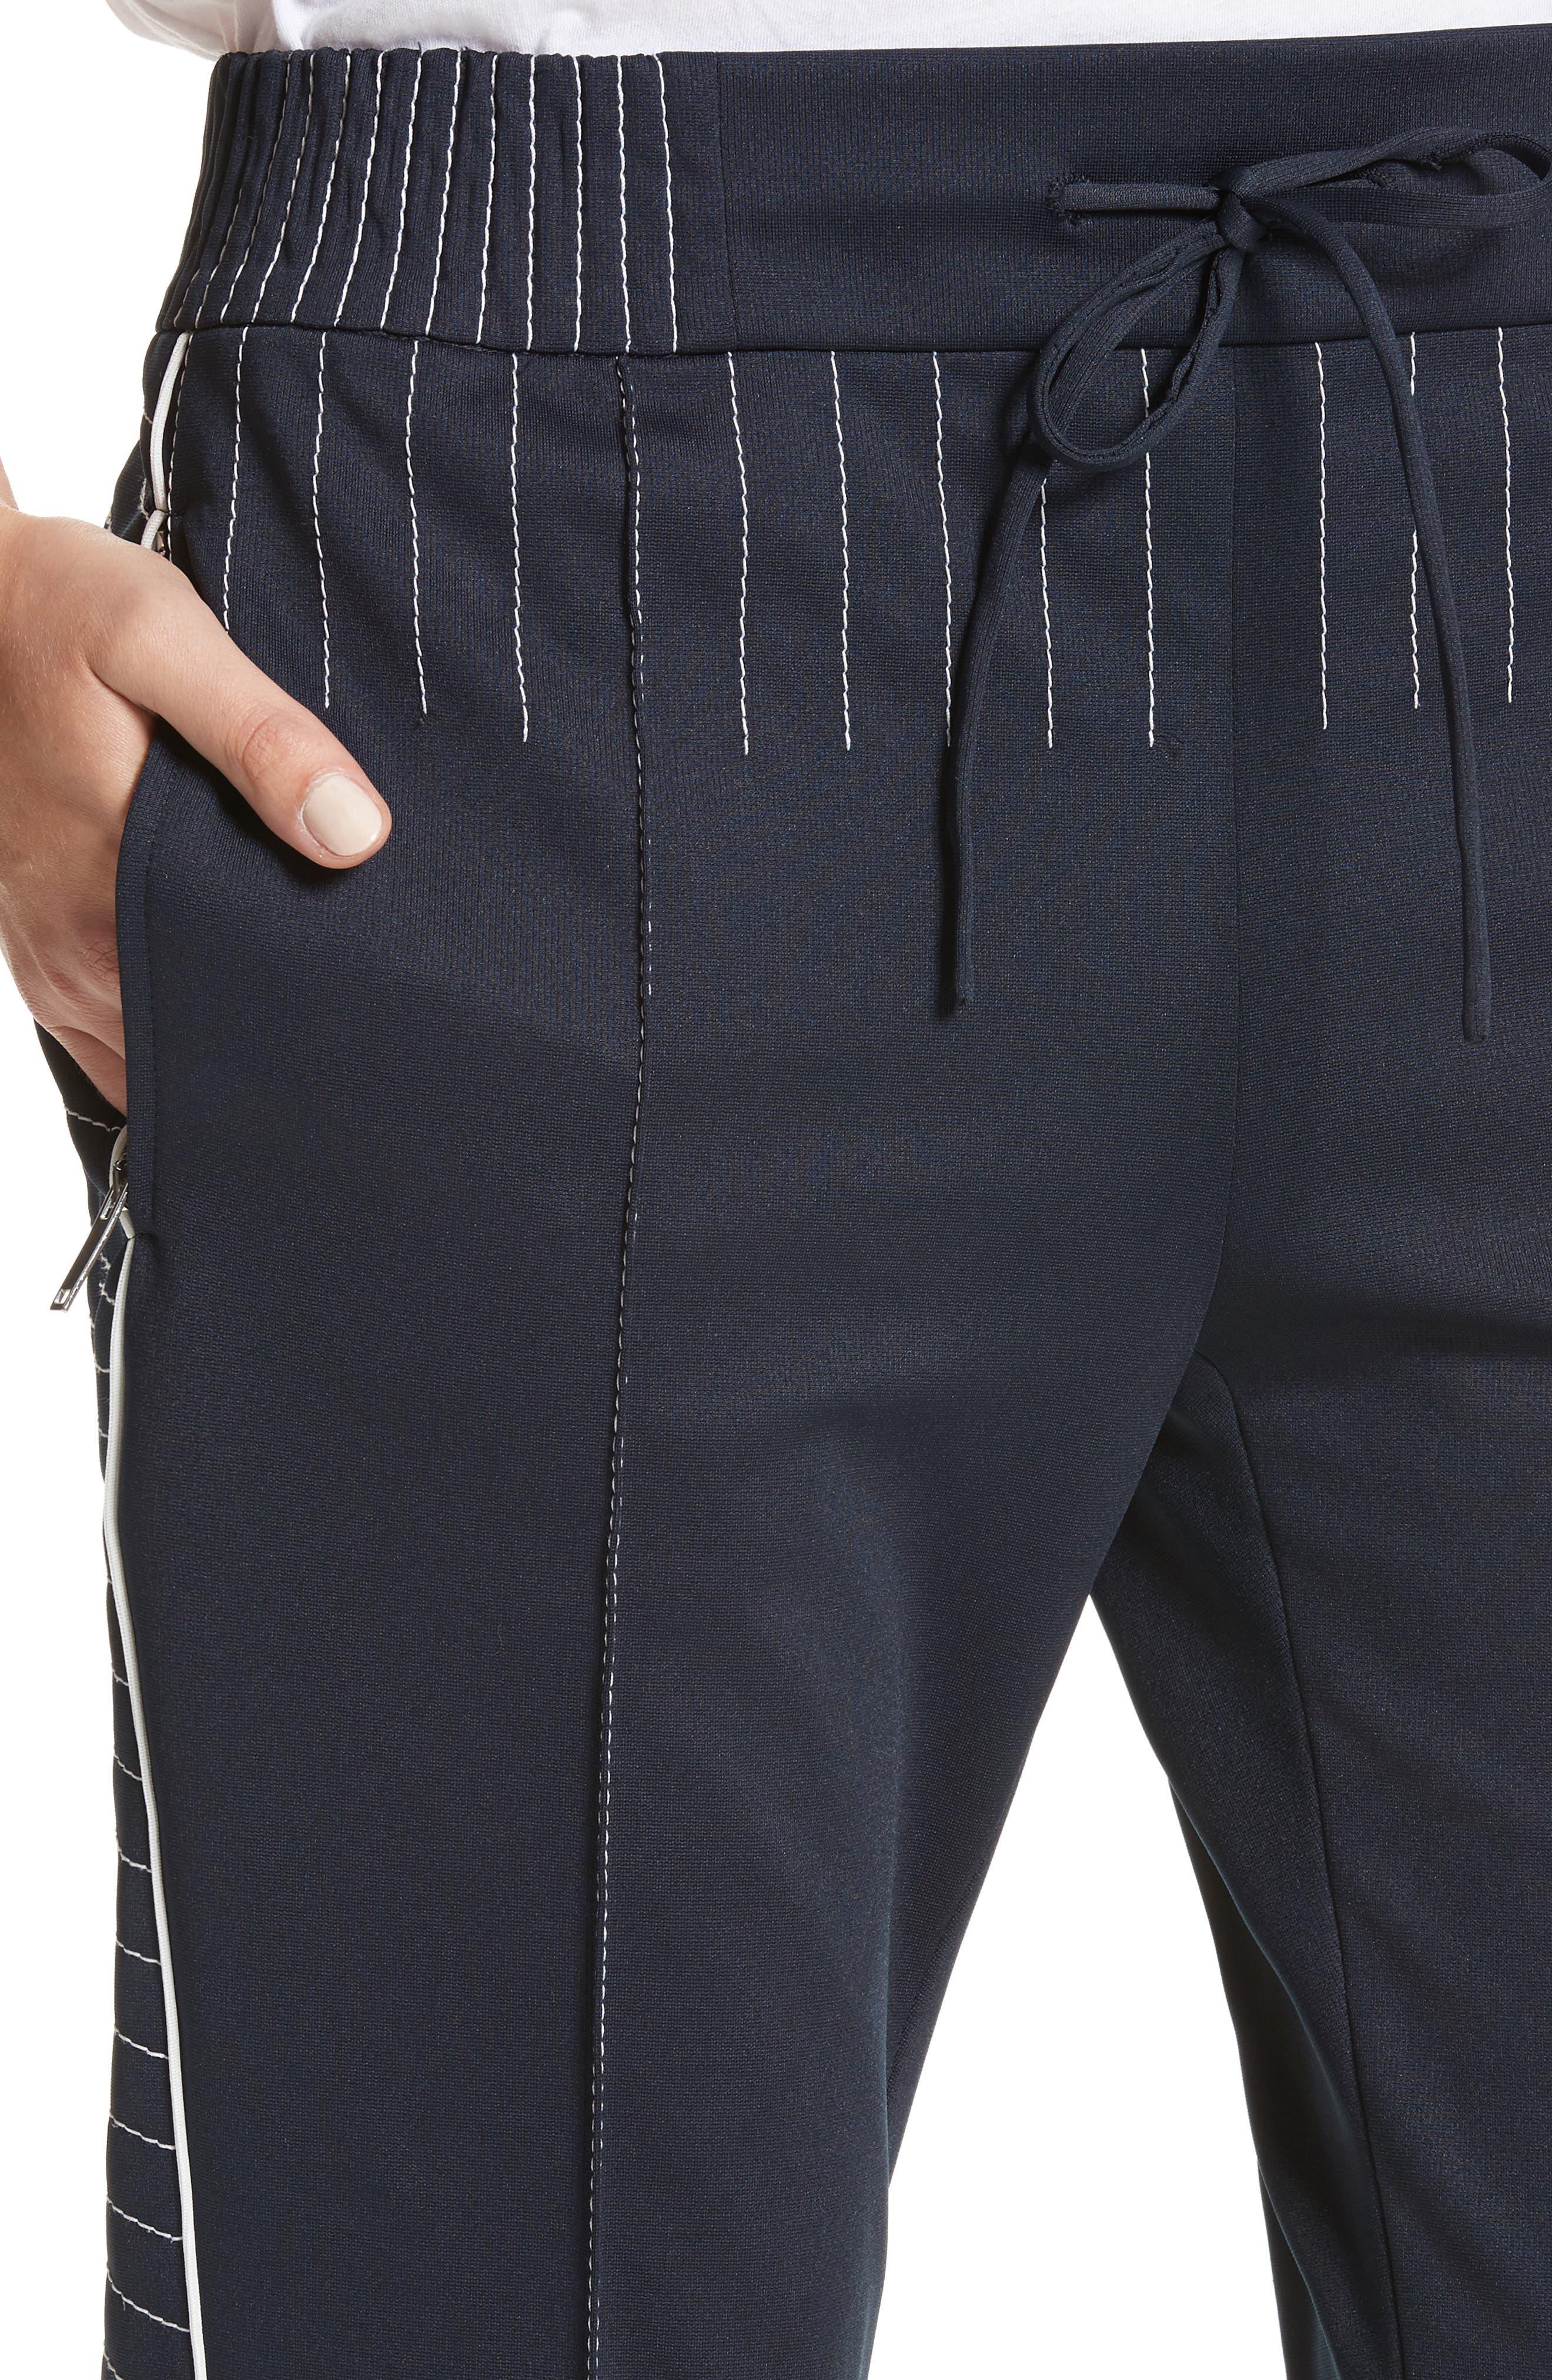 Techno Stretch Jersey Track Pants,                             Alternate thumbnail 4, color,                             Navy